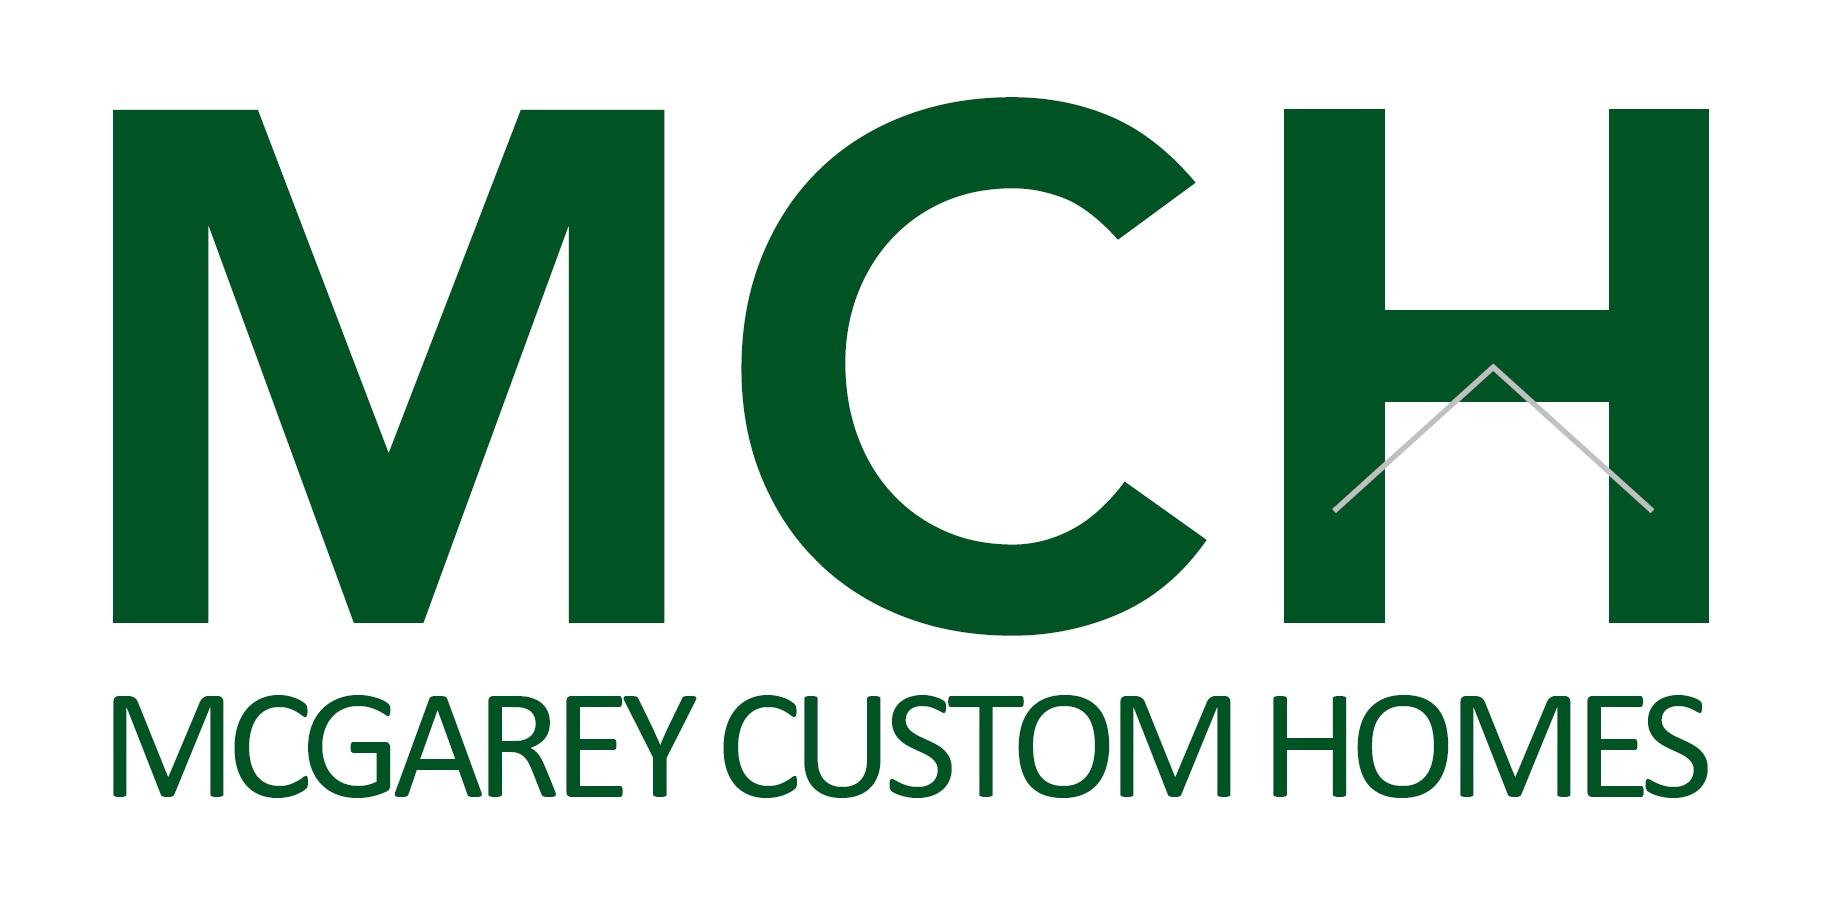 McGarey Custom Homes